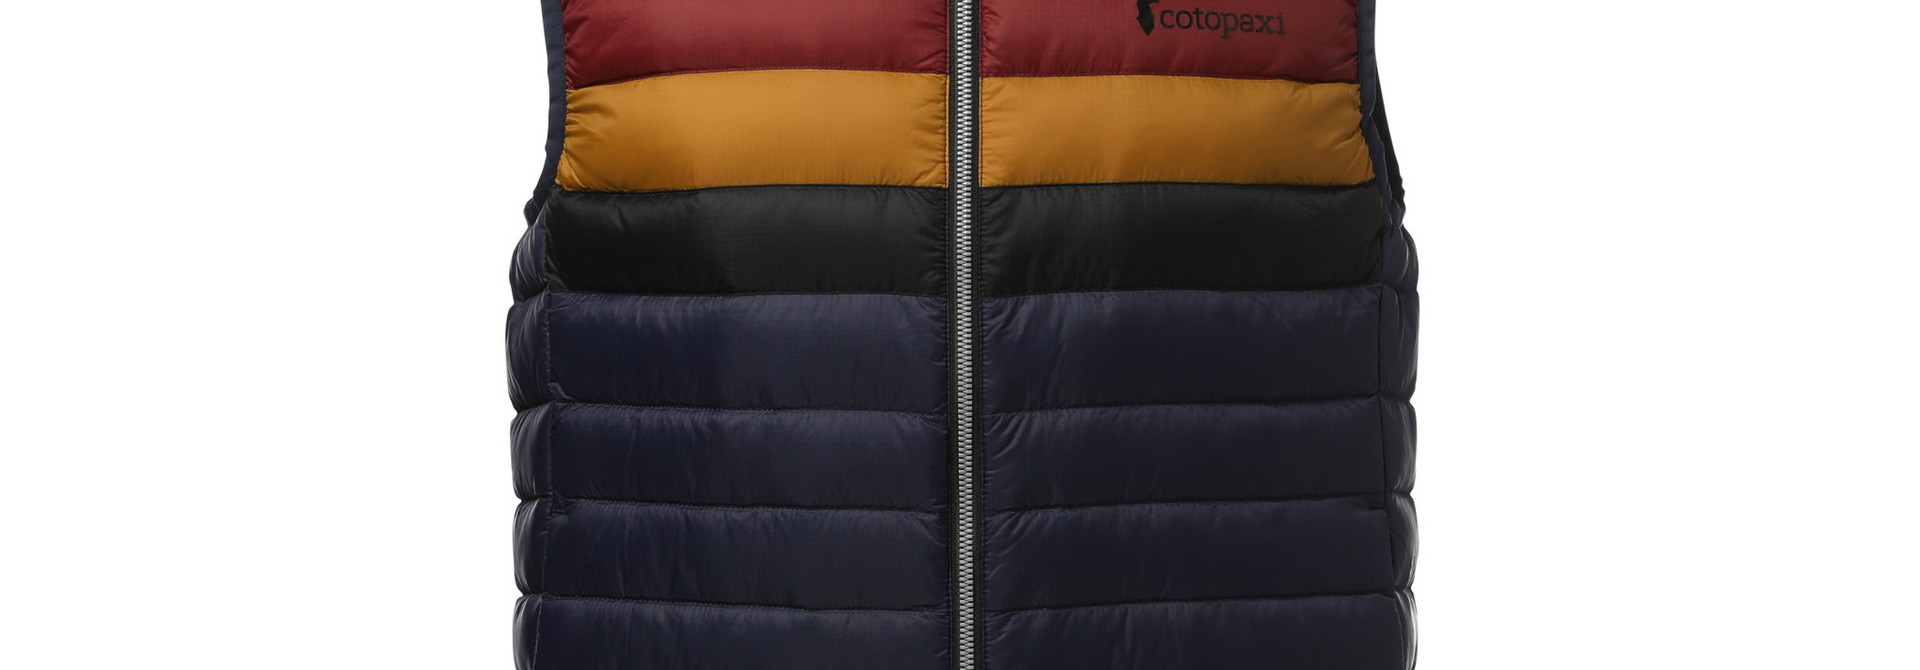 Cotopaxi M's Fuego Down Vest